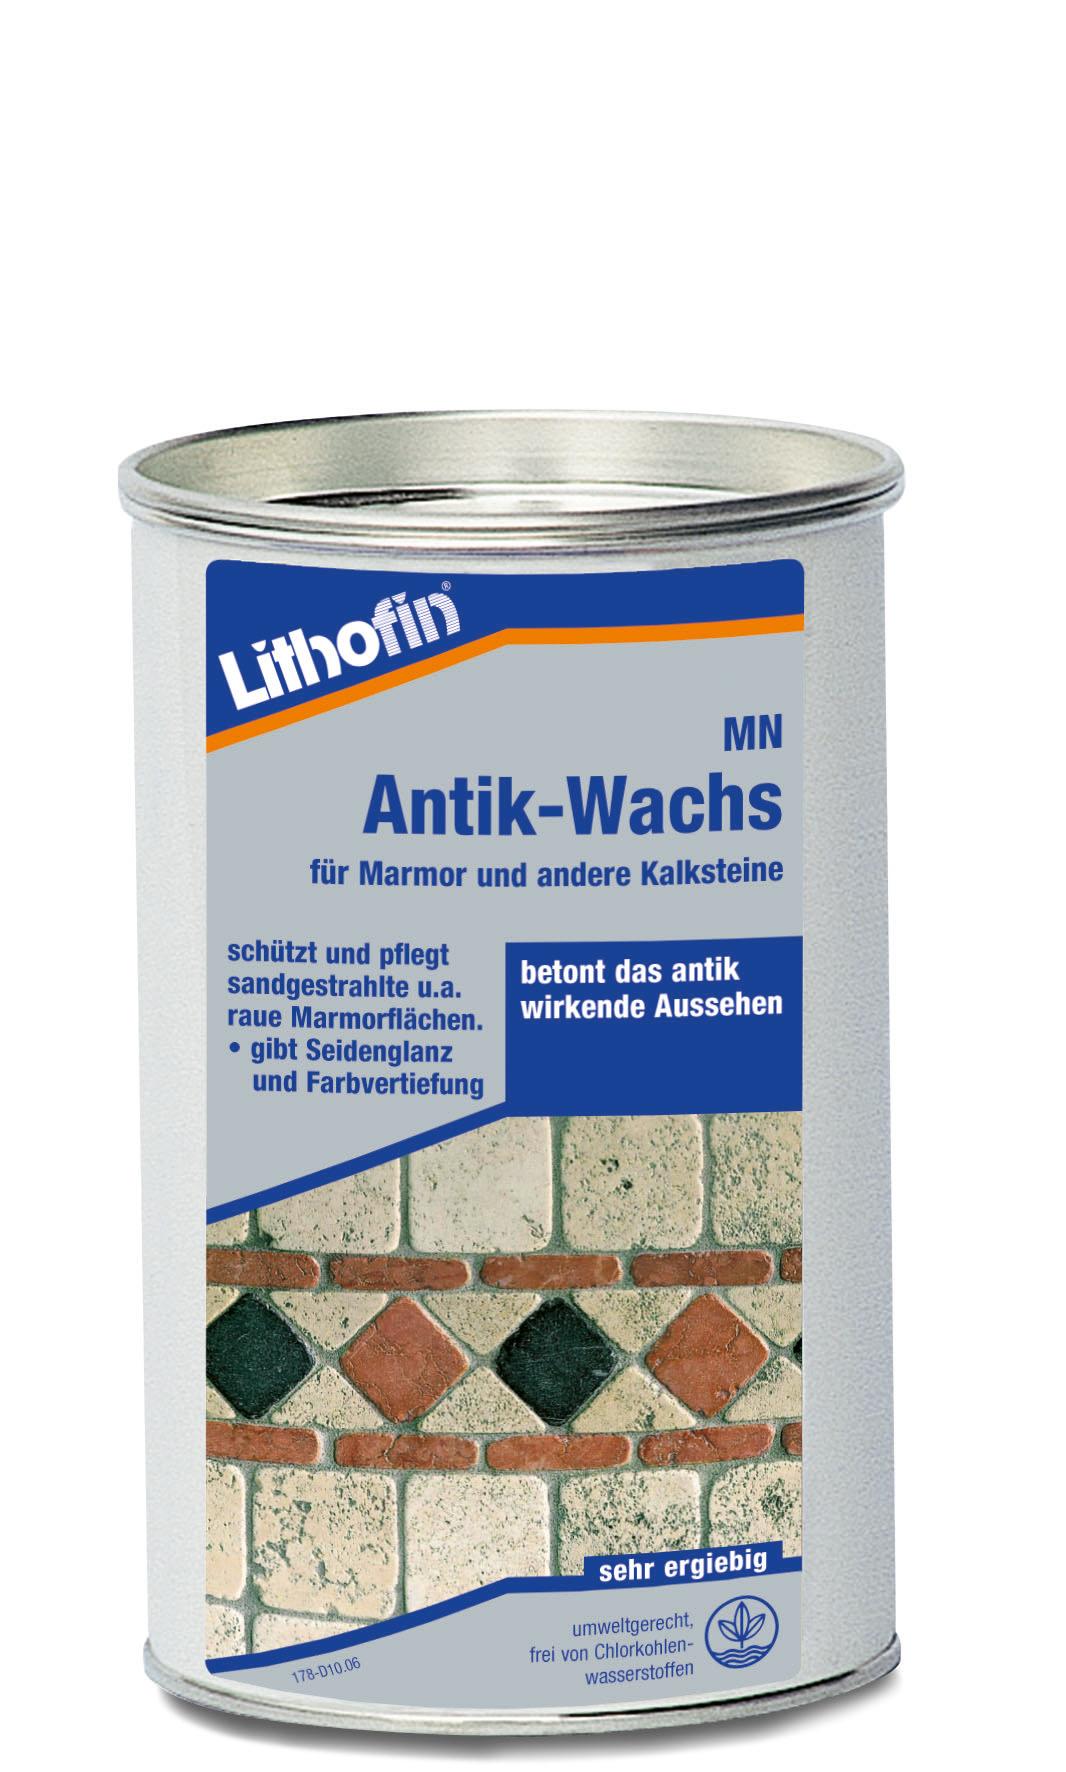 Lithofin MN Antikwachs 1 l